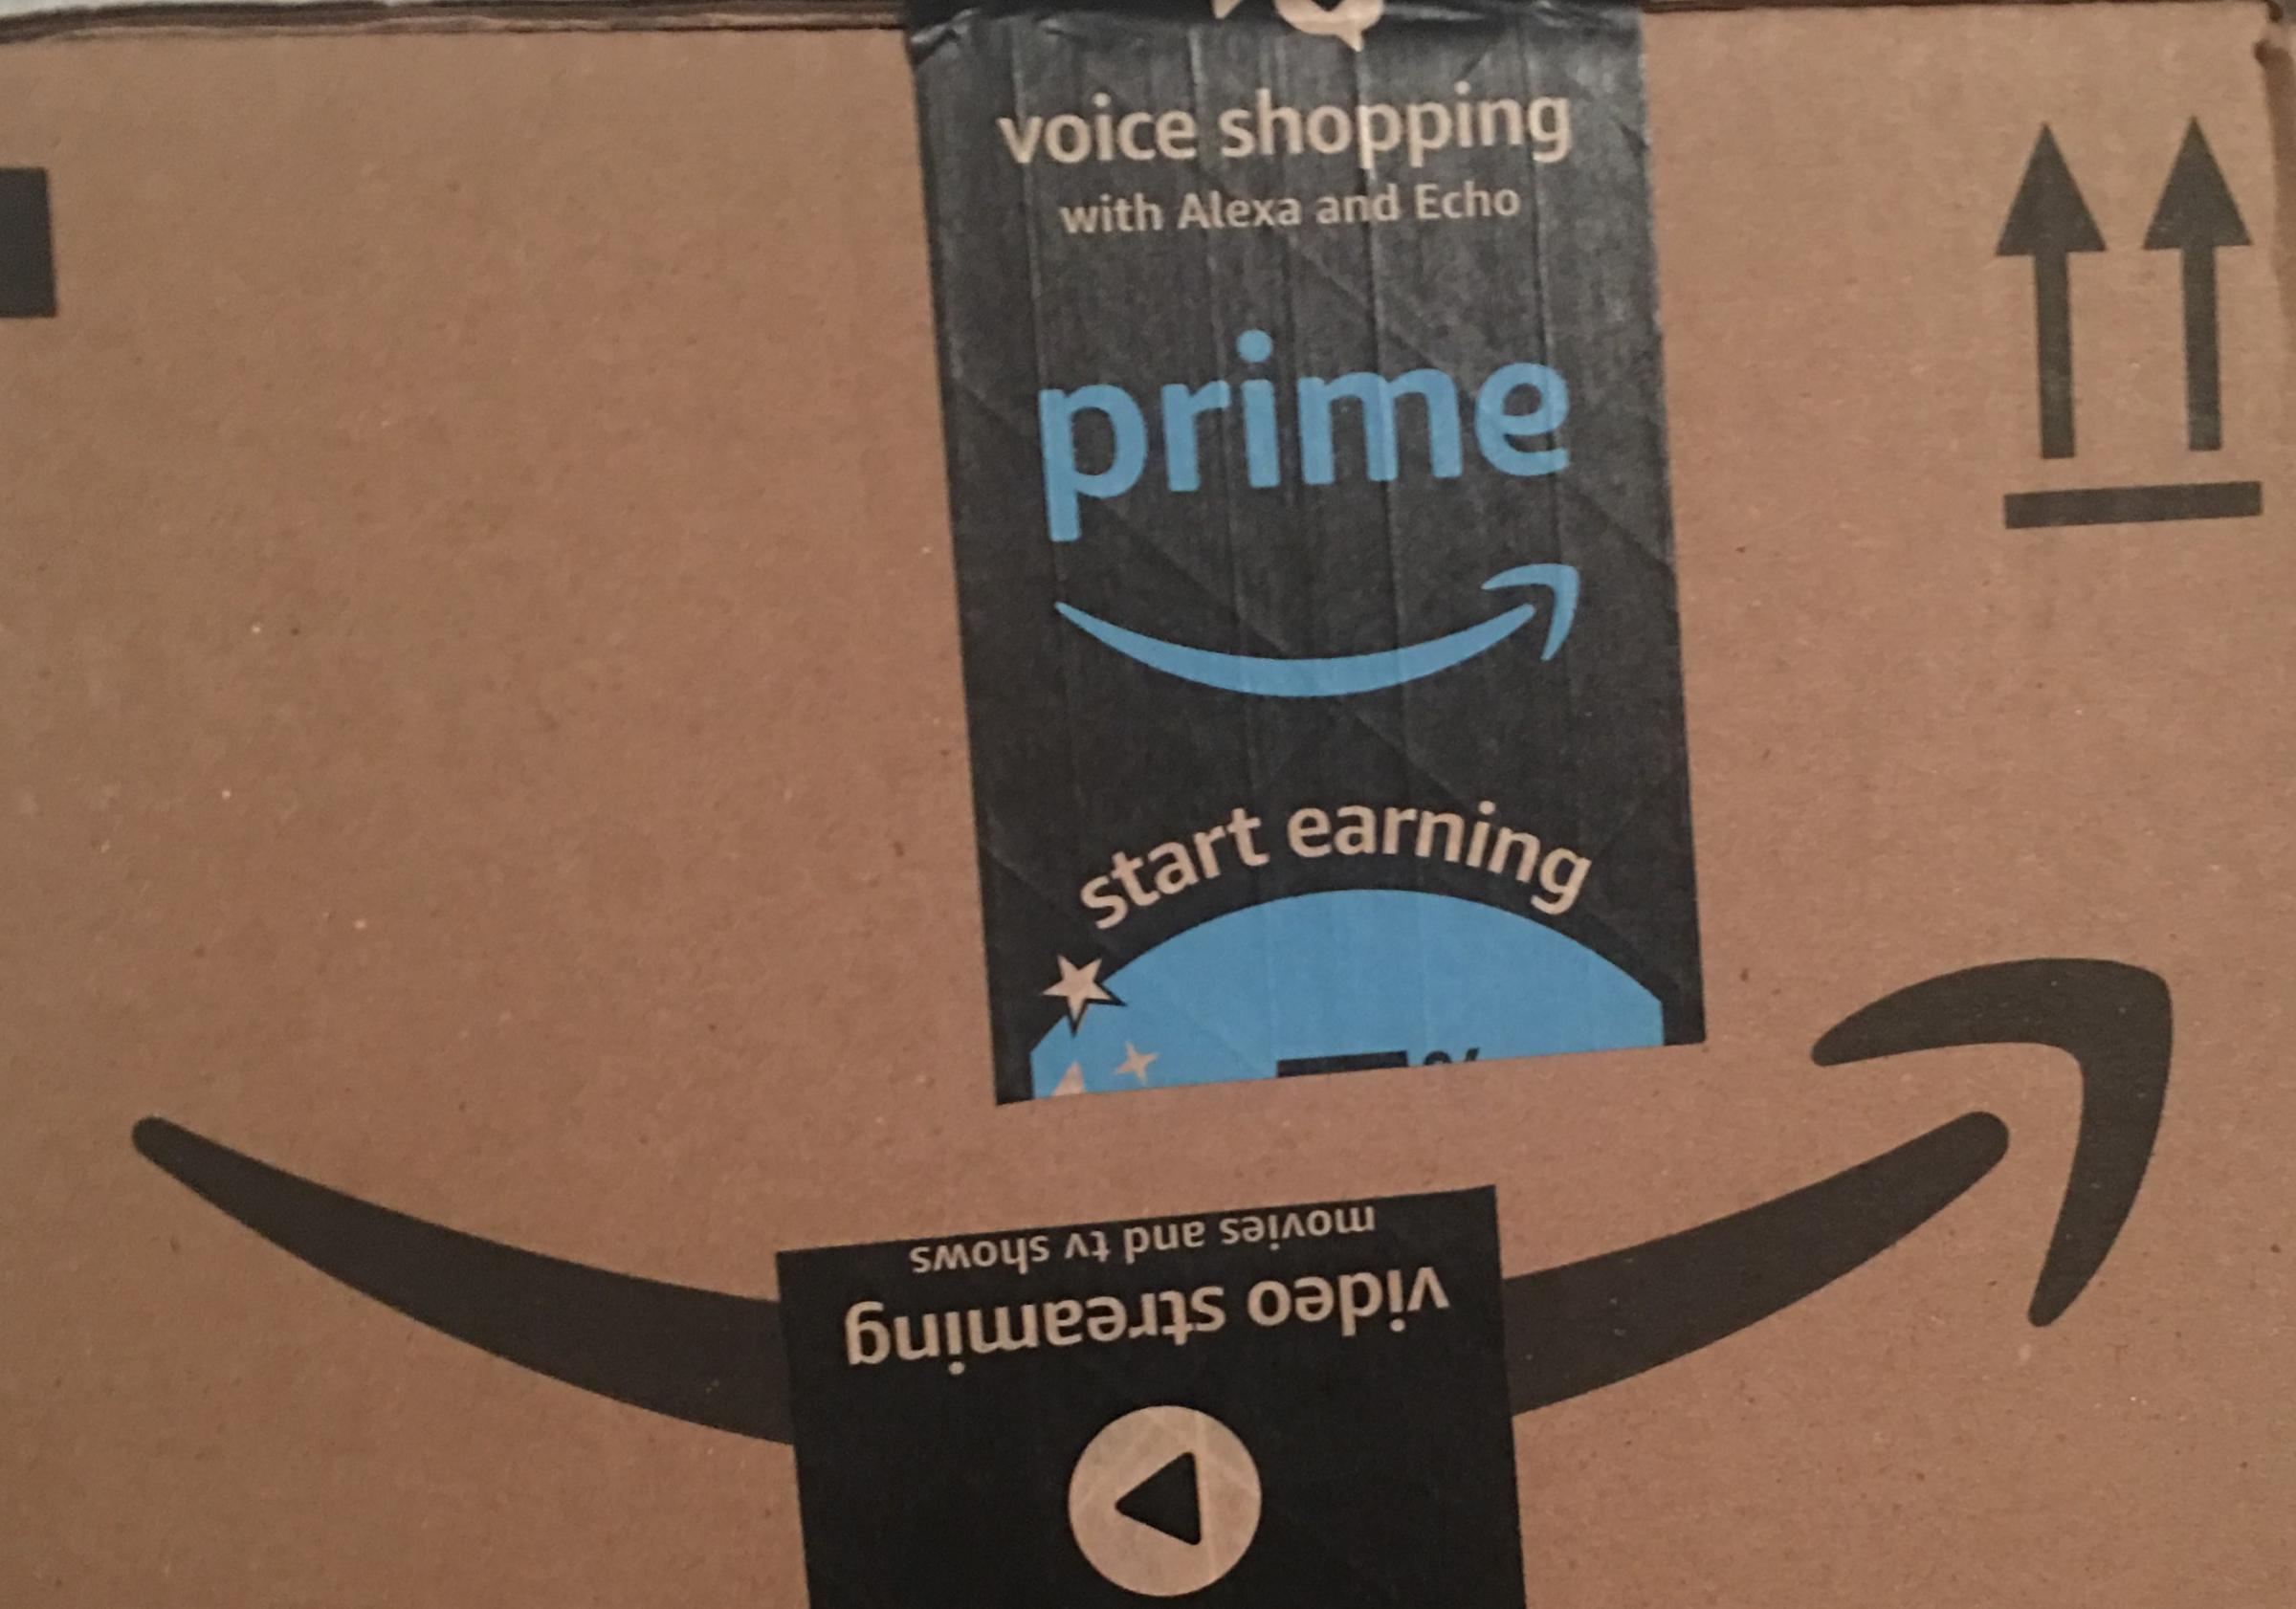 Amazon Announces New Fulfillment Center In Kernersville | WUNC